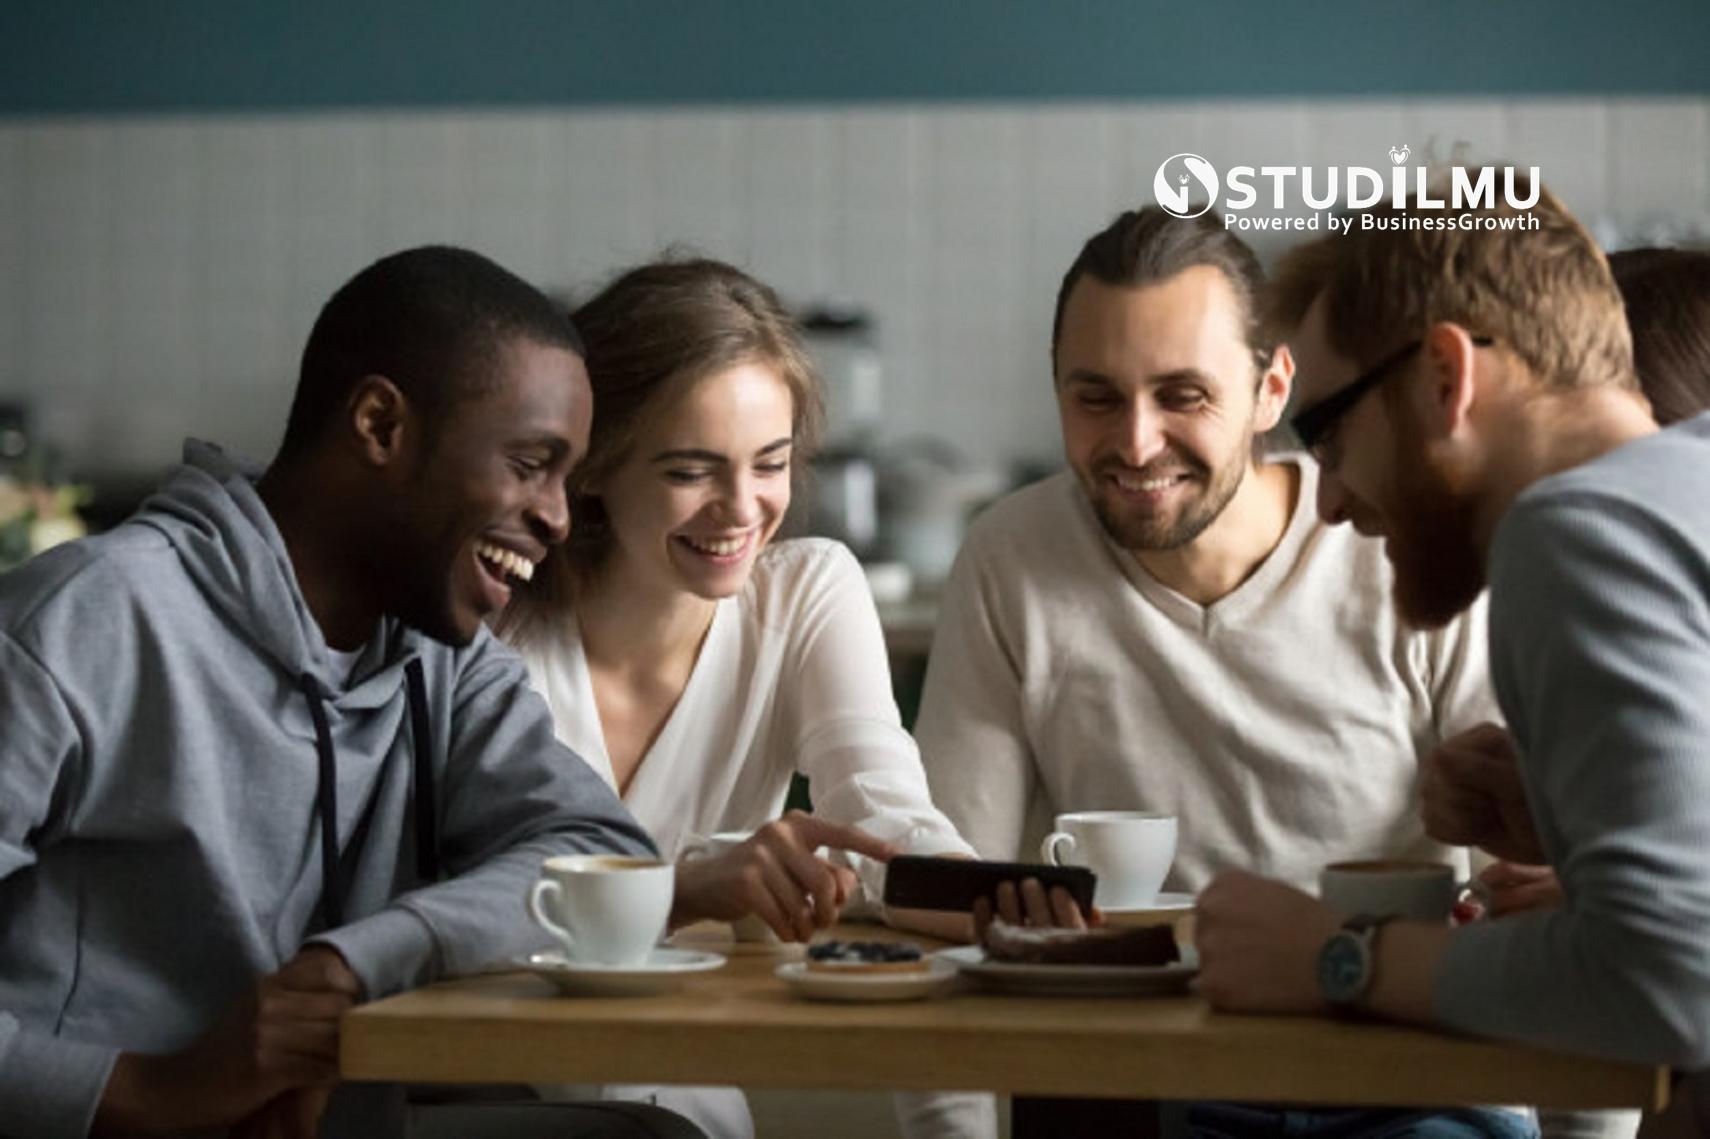 STUDILMU Career Advice - 6 Cara Bersosialisasi Ala Kaum Milenial